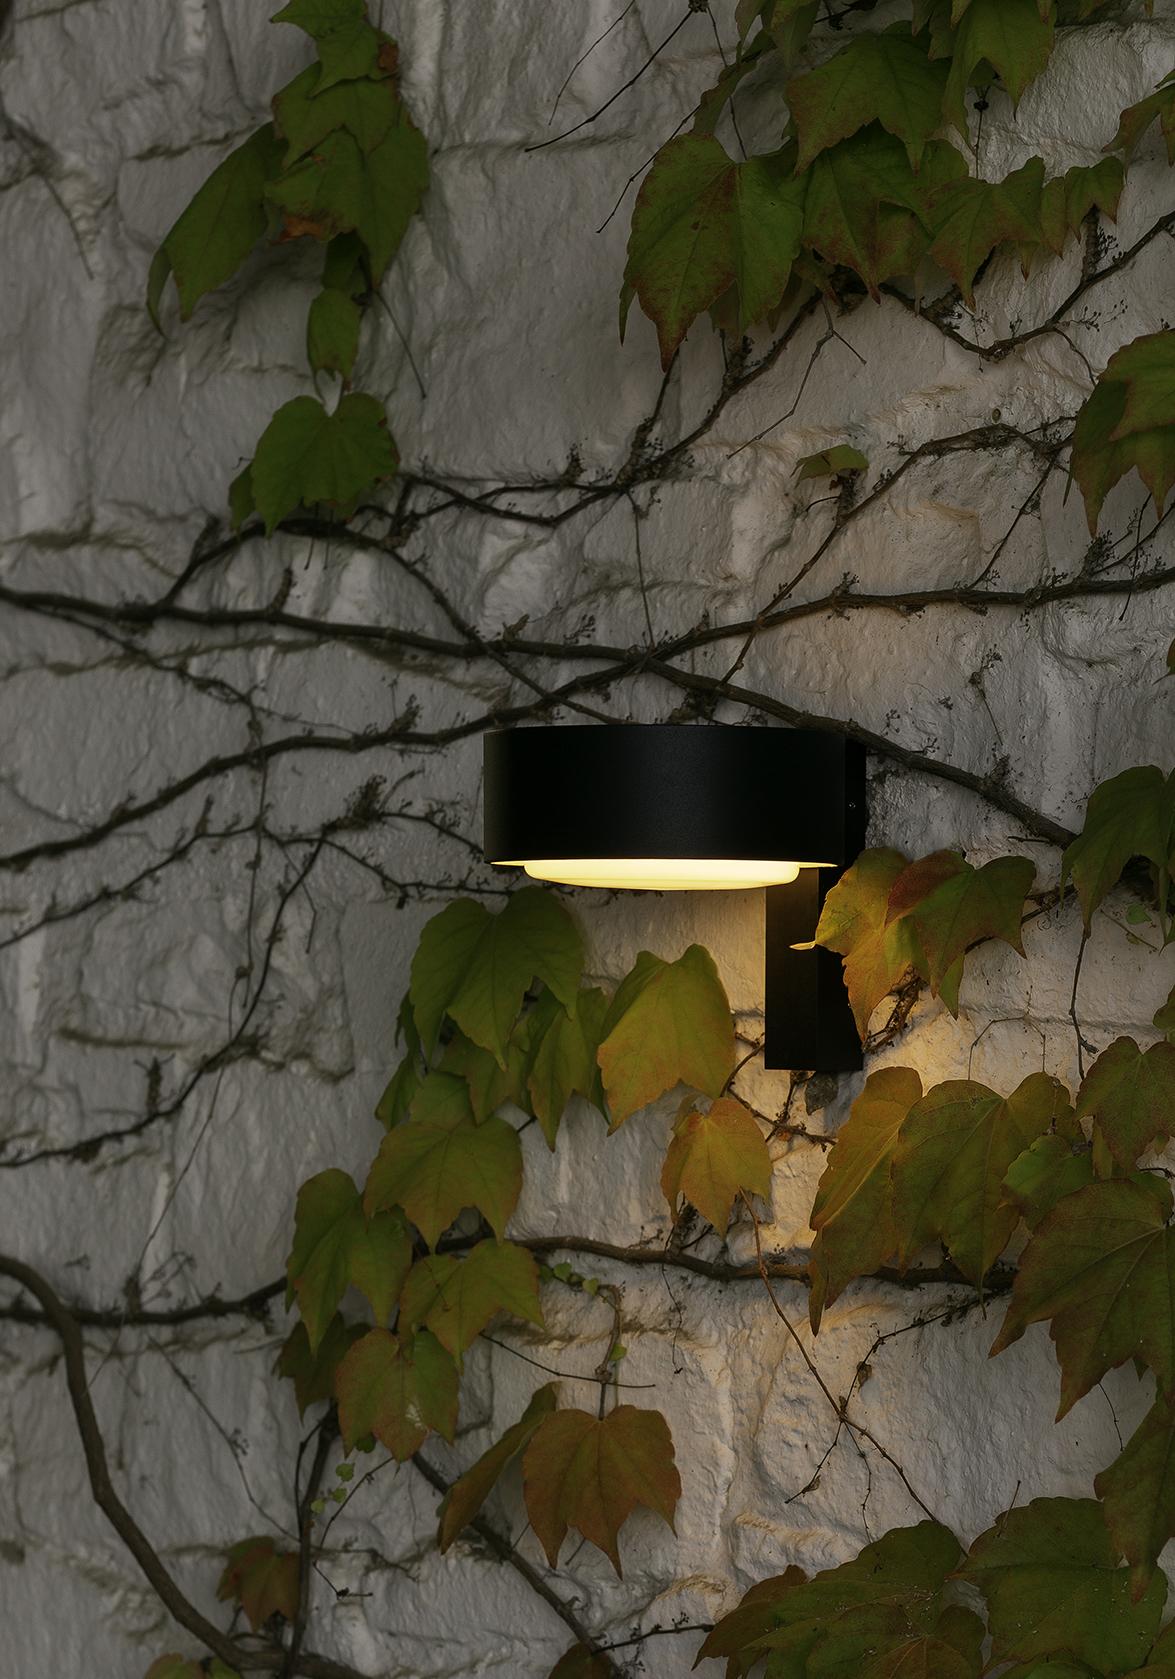 Wall Lamp - Plaff-on!